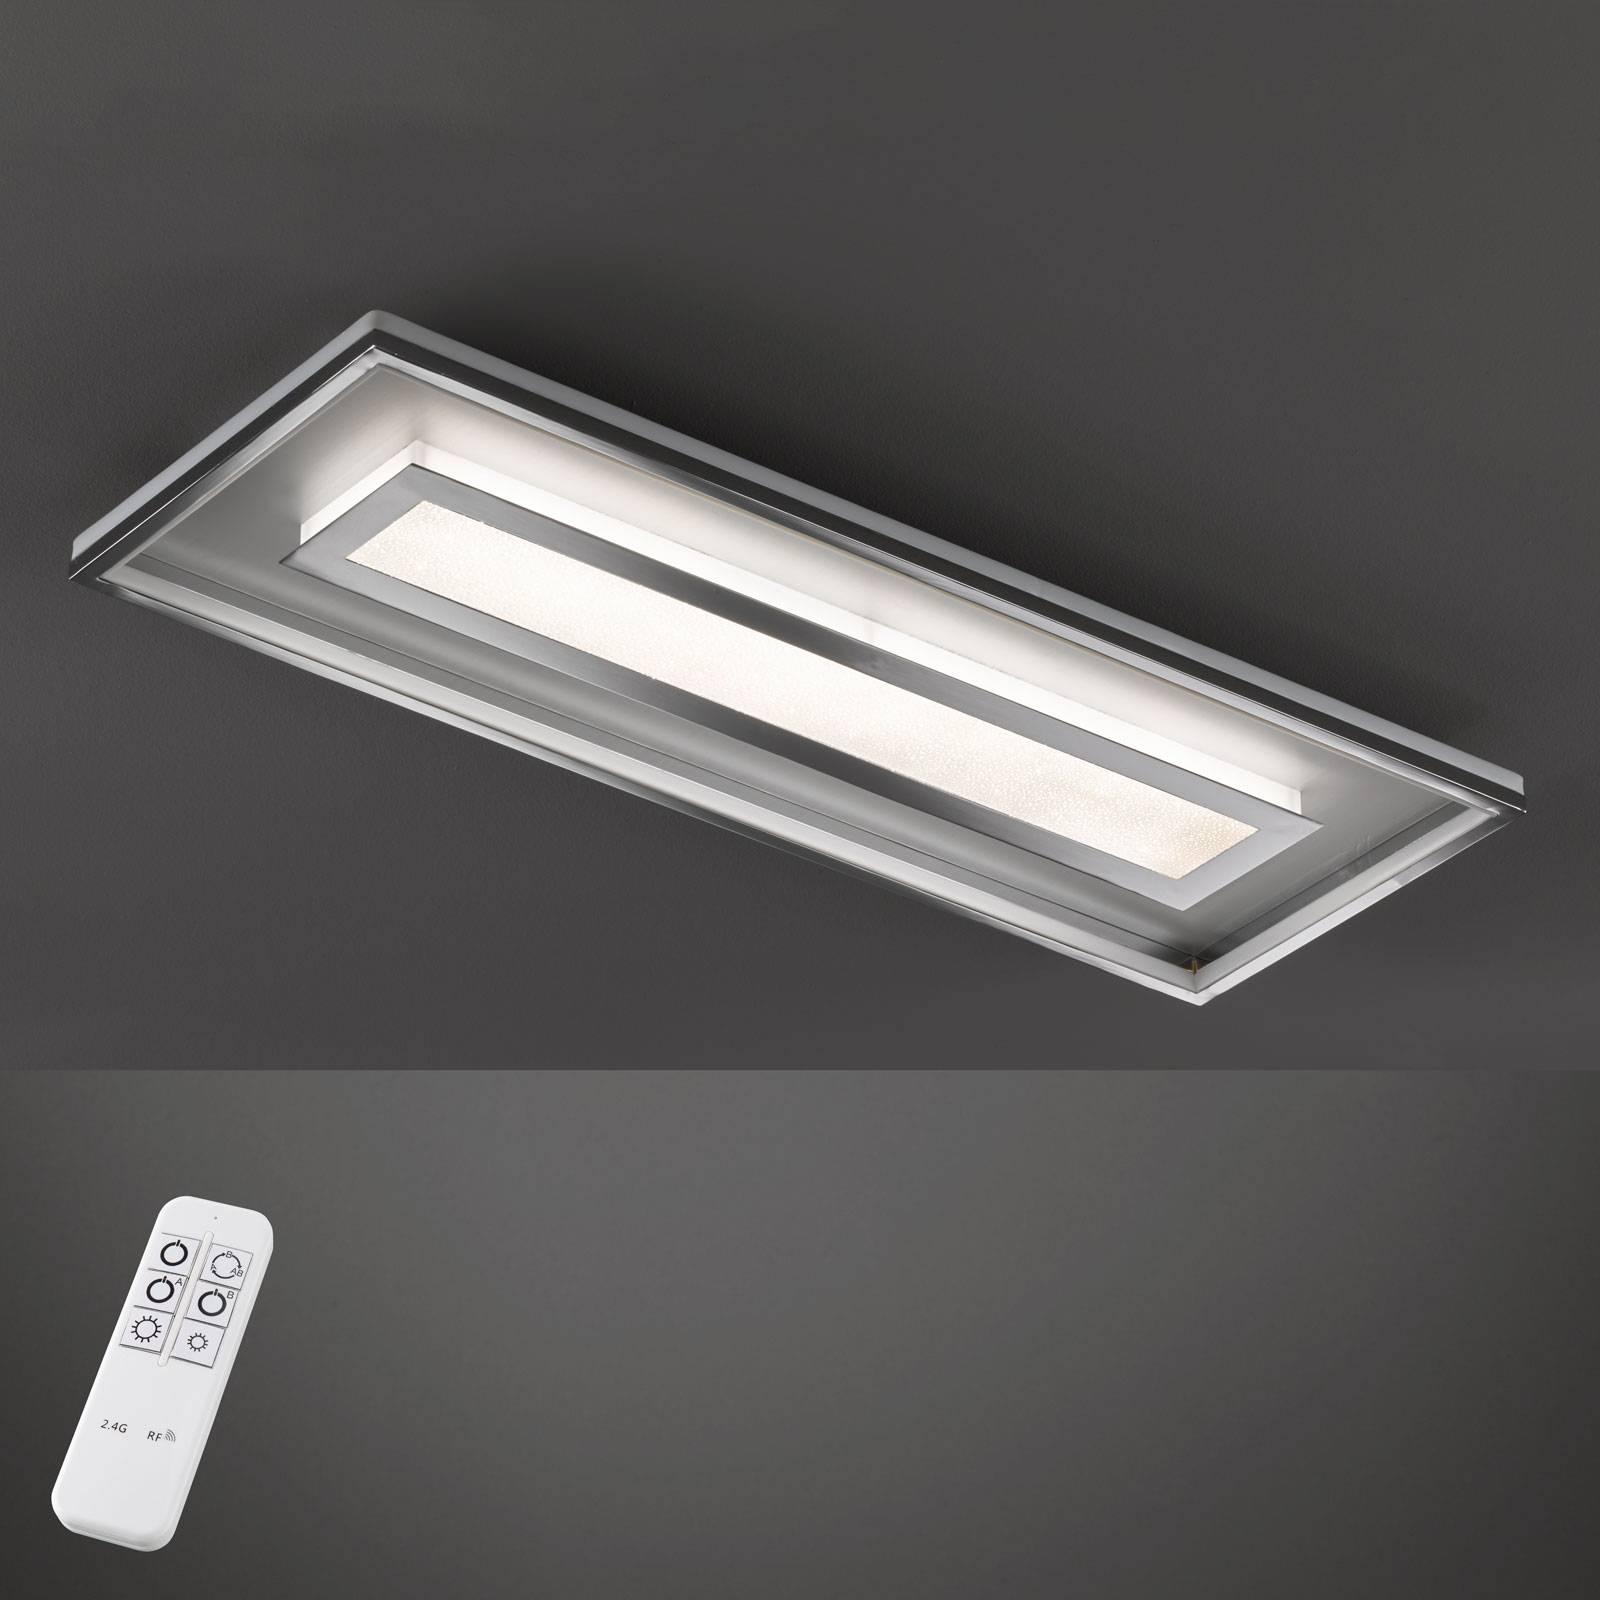 LED plafondlamp Bug rechthoekig 120x40 cm, chroom